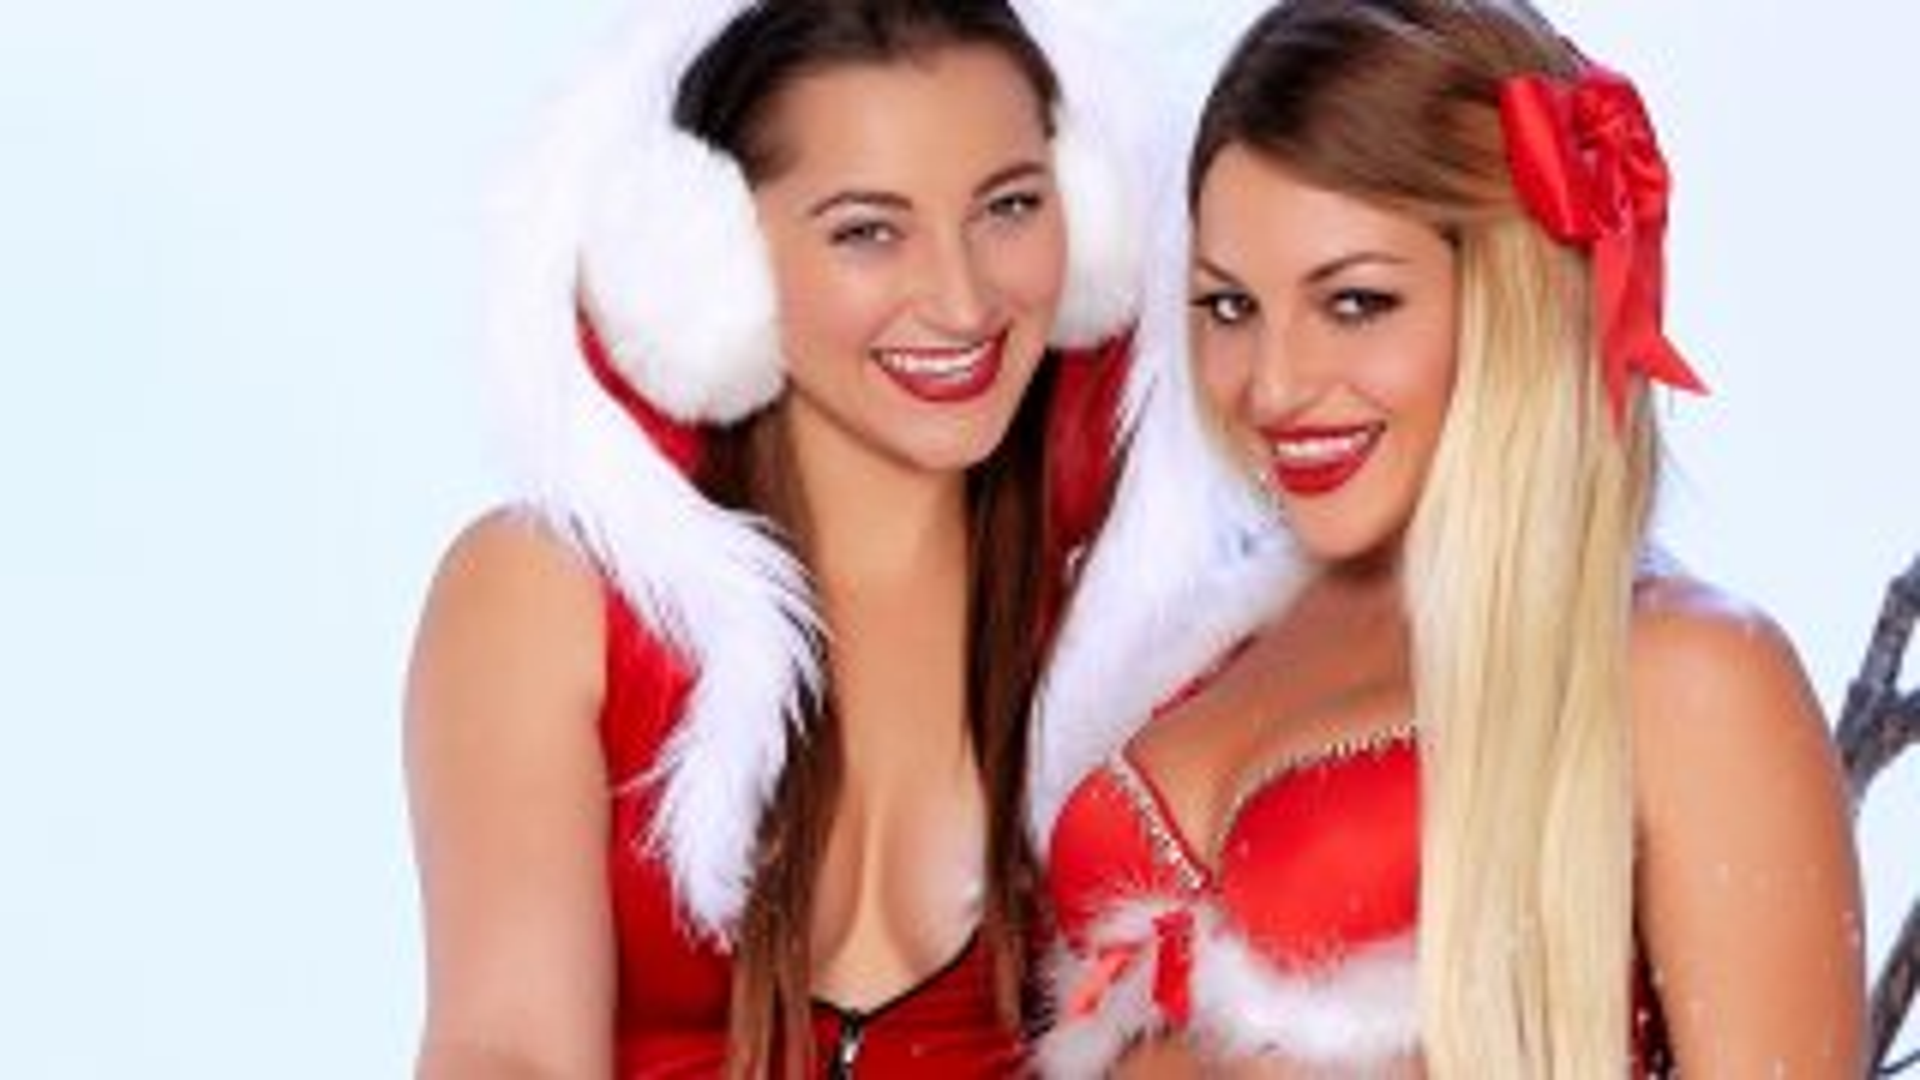 Santa's Ride - When Girls Play